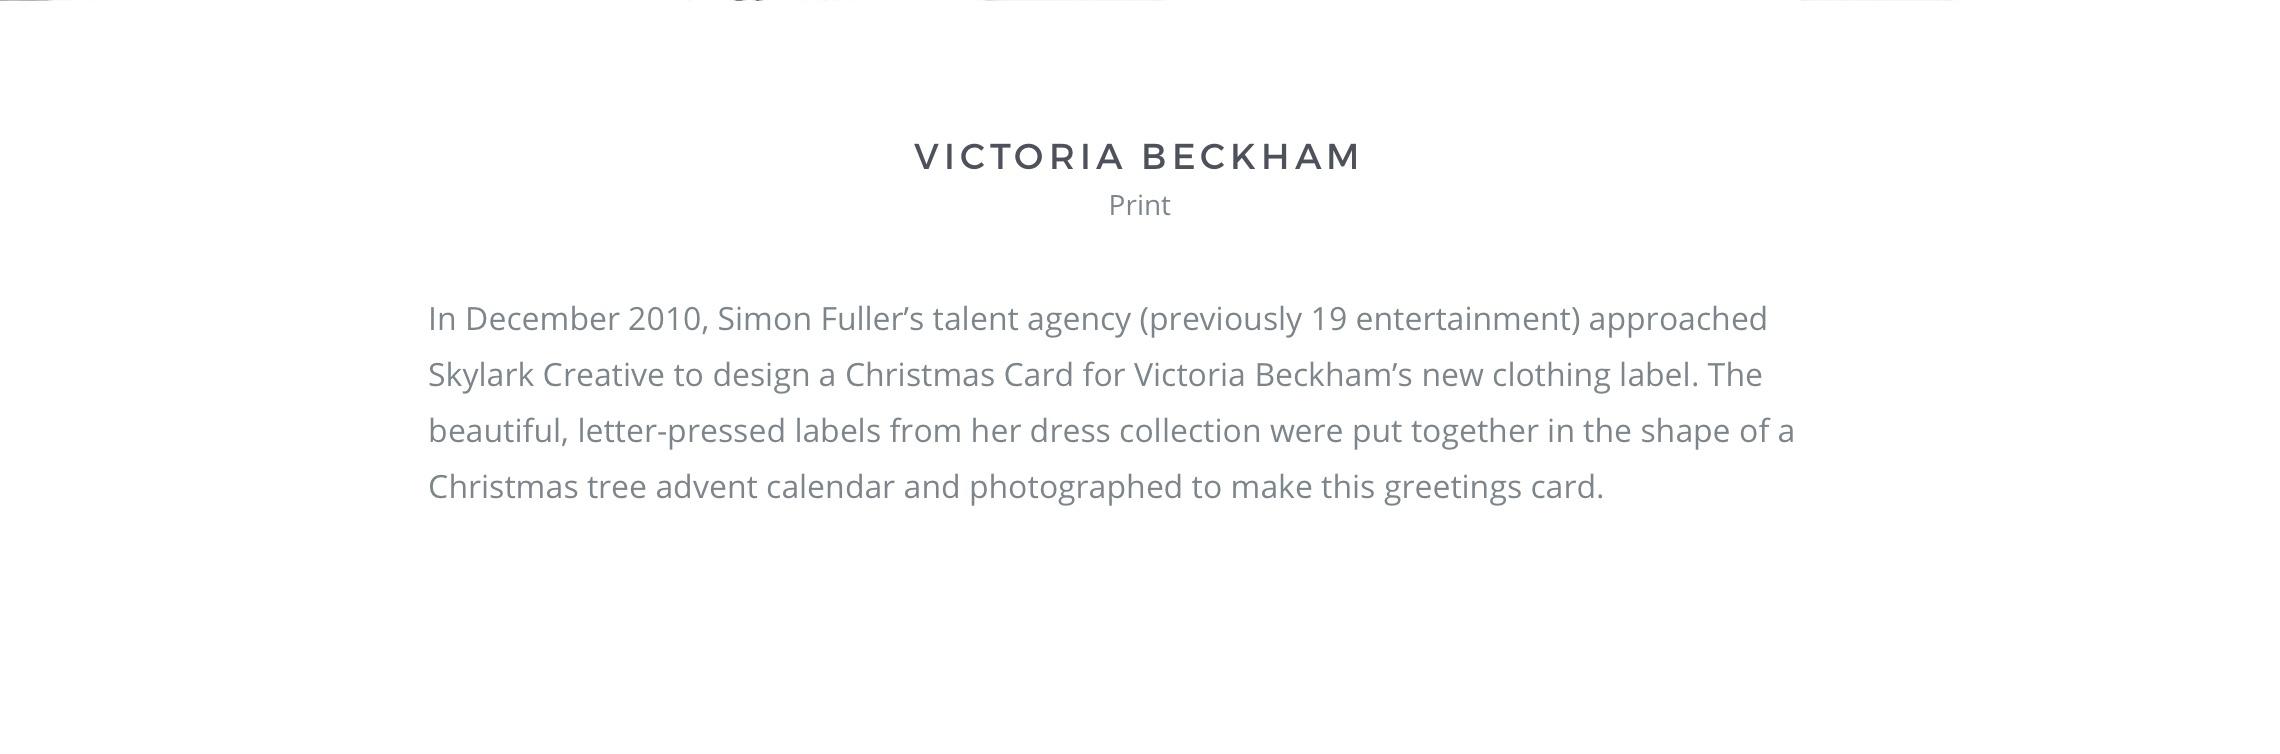 Victoria Beckham Christmas Card On Behance